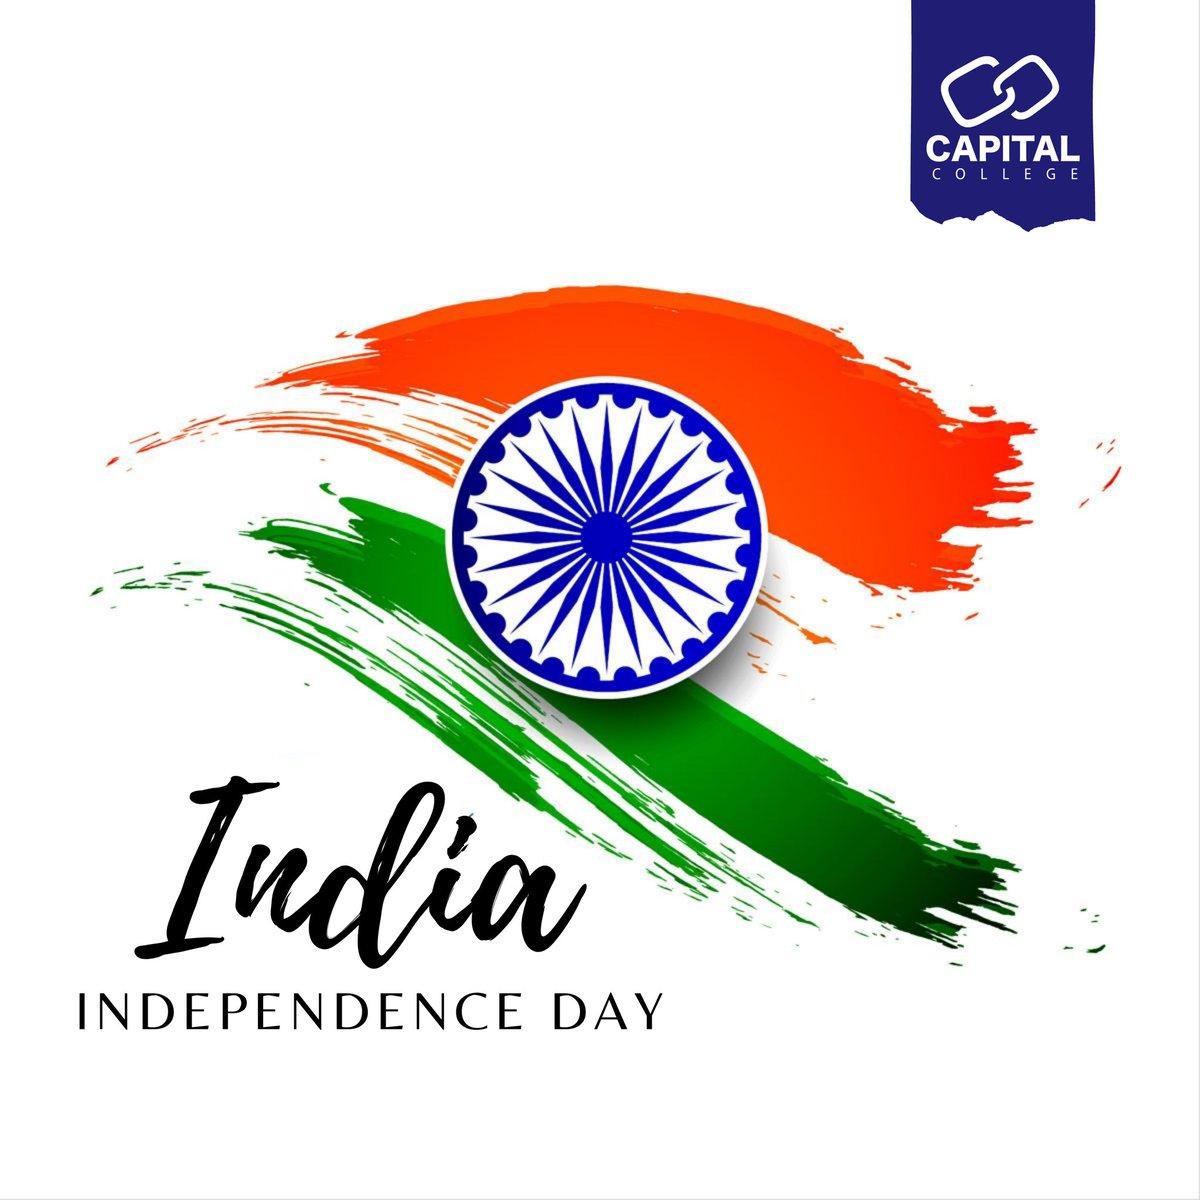 May your spirits rise with the flag today!   Happy Independence Day!  #independenceday #india #Capital #Capitalcollege #mydubai #Education #sharjah #Dubai #UAE #ajman #السعودية #الامارات #ابوظبي #الشارقة https://t.co/PMDh8qkVrA